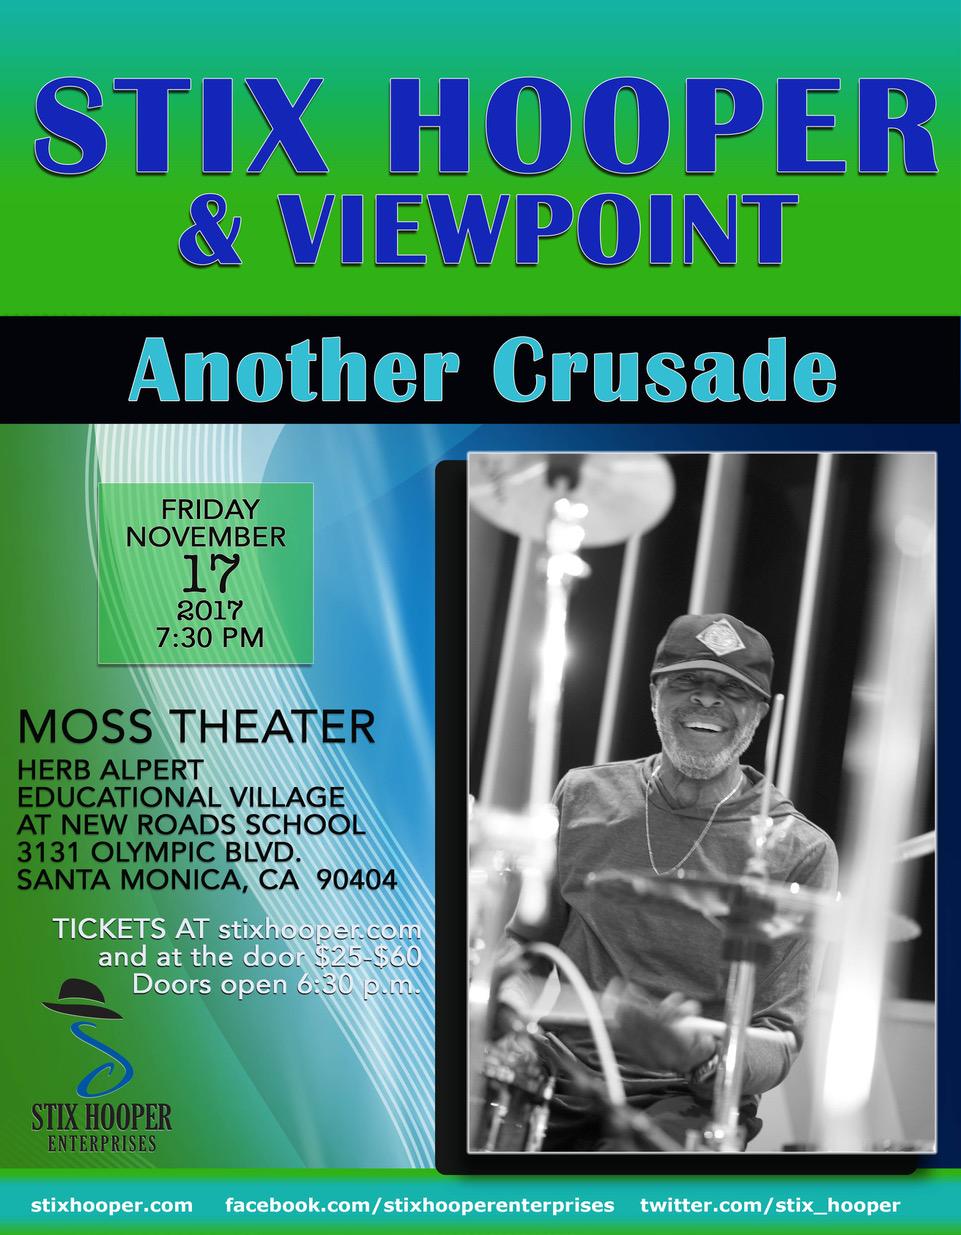 Stix Hooper Another Crusade 11-17-2017